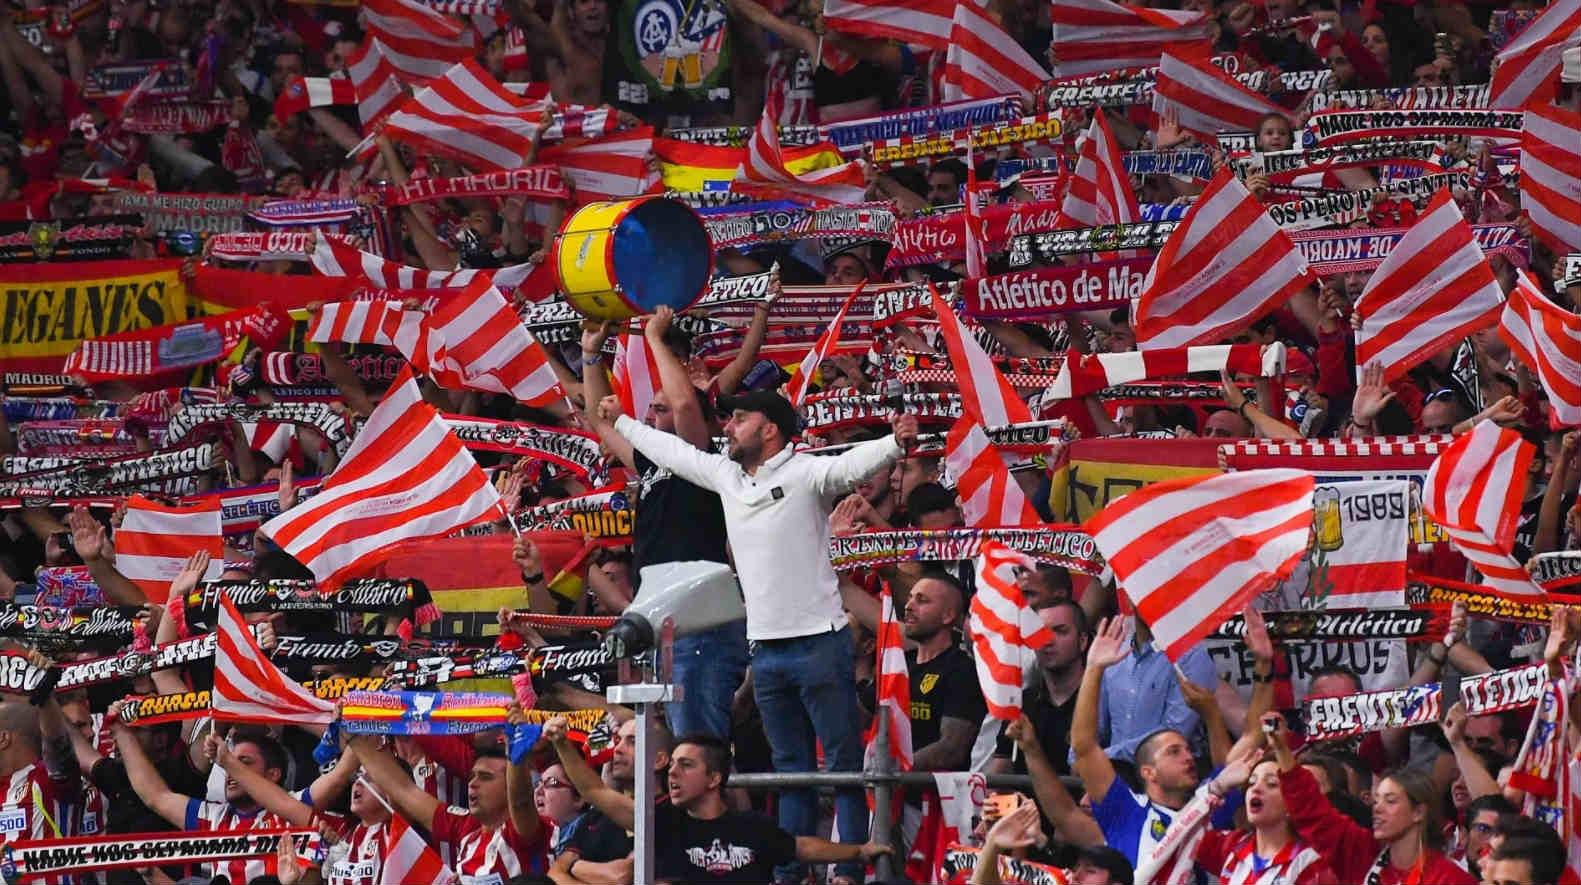 fanaty atletiko madrid ispaniya stadion vanda metrapolitano